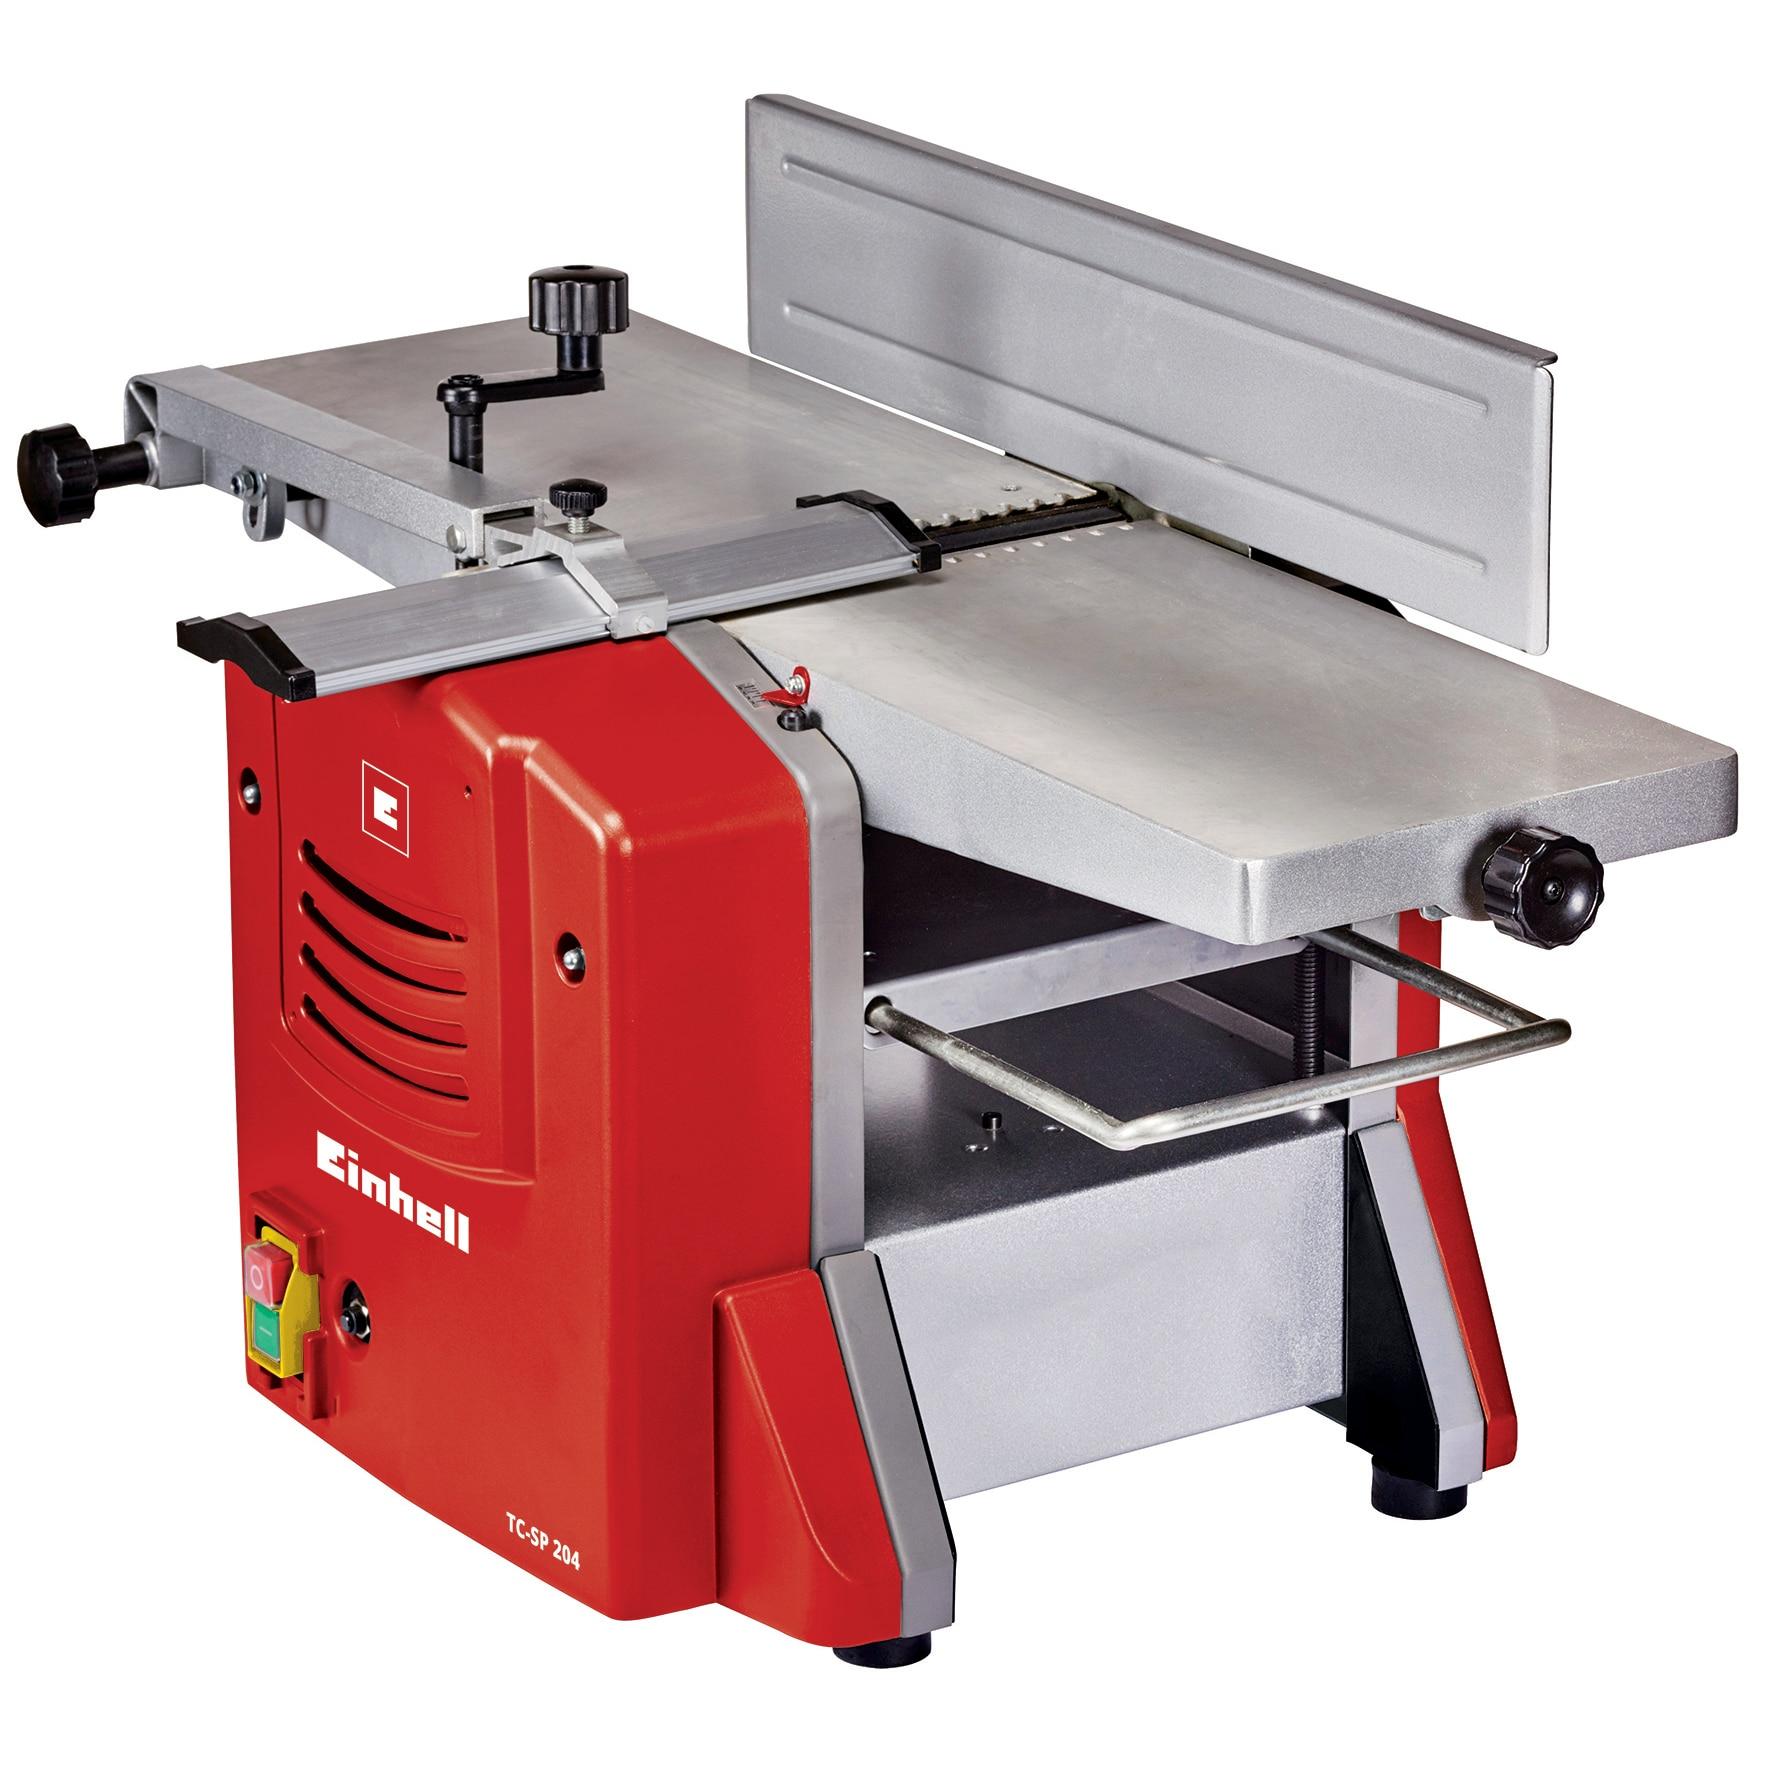 Fotografie Masina de rindeluit Einhell TC-SP 204, 1500 W, 3 mm max indepartare material, latime max rindeluire 204 mm, deschiere max. grosime 120 mm